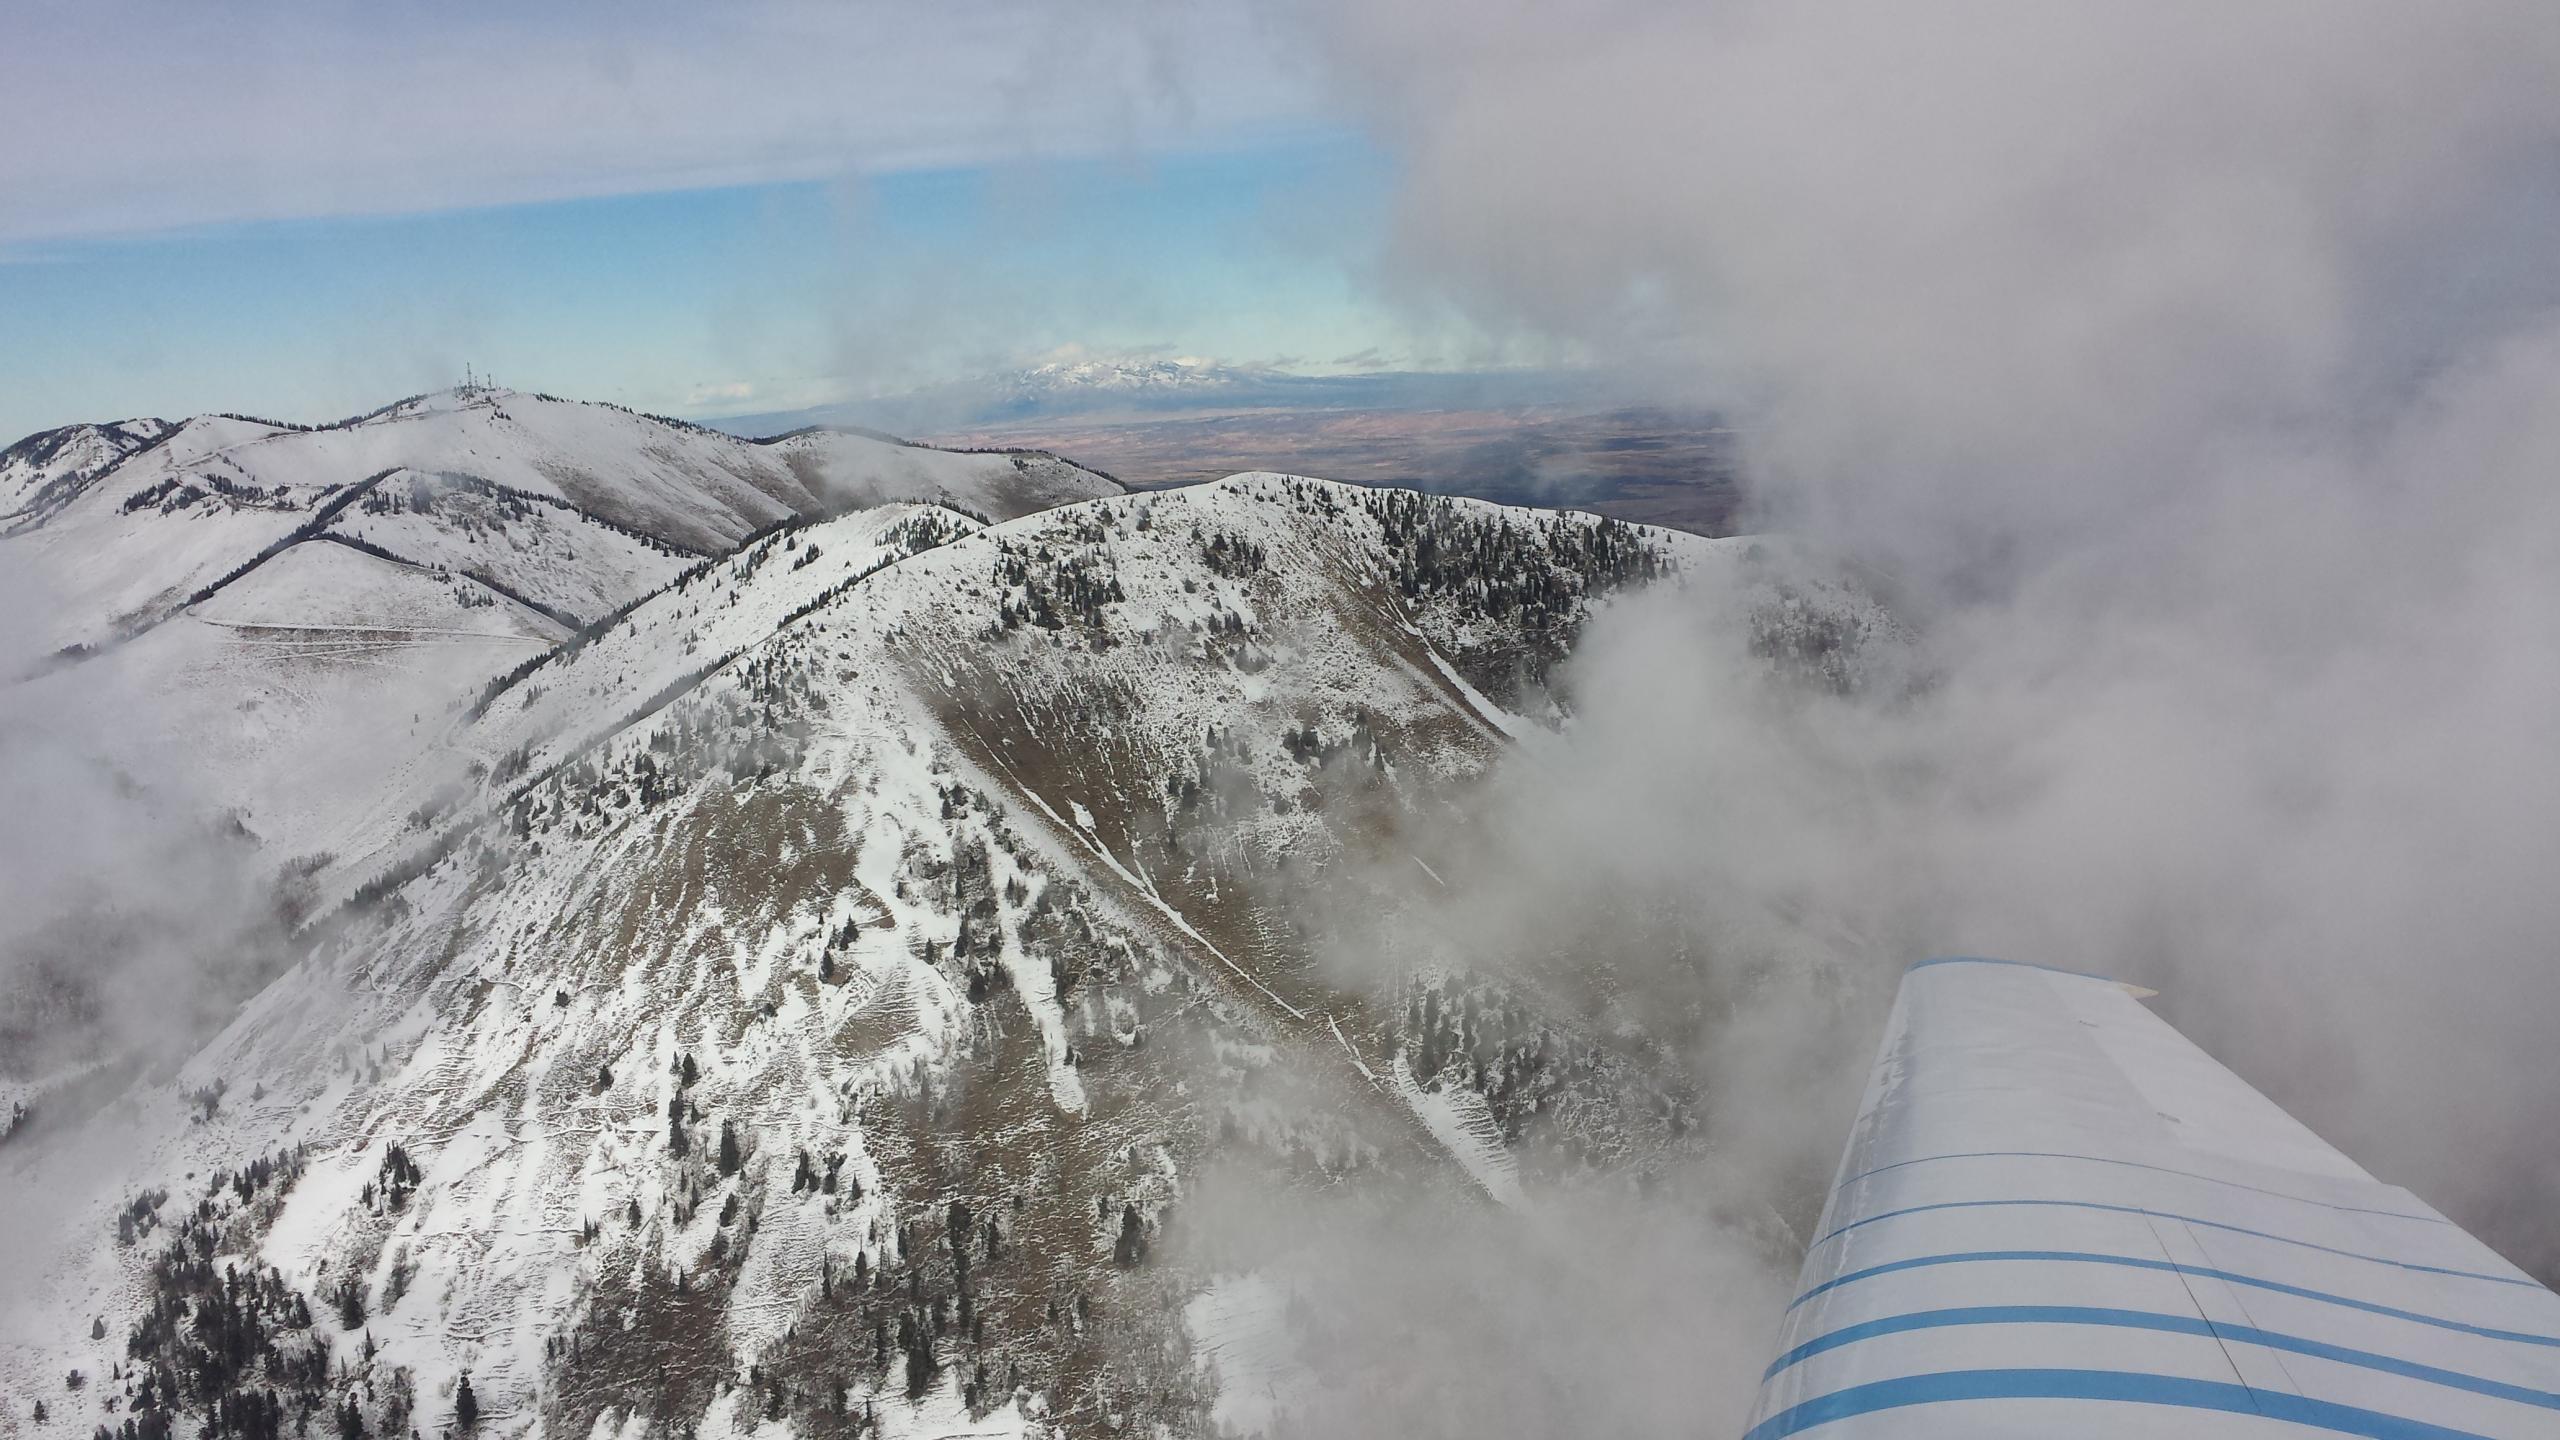 Blue Mountains Utah Dec 12, 2016